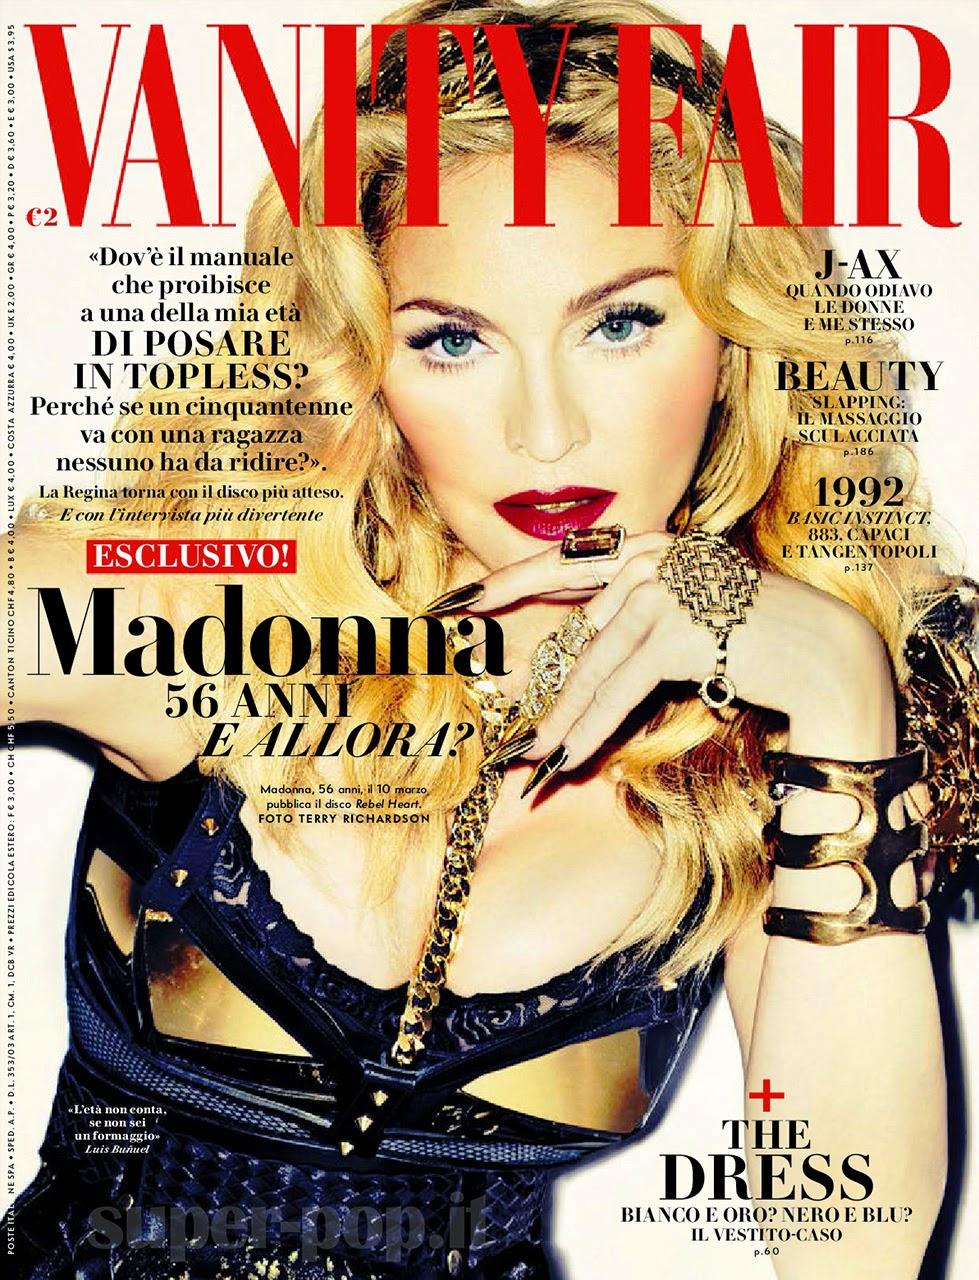 madonna+vanity+fair